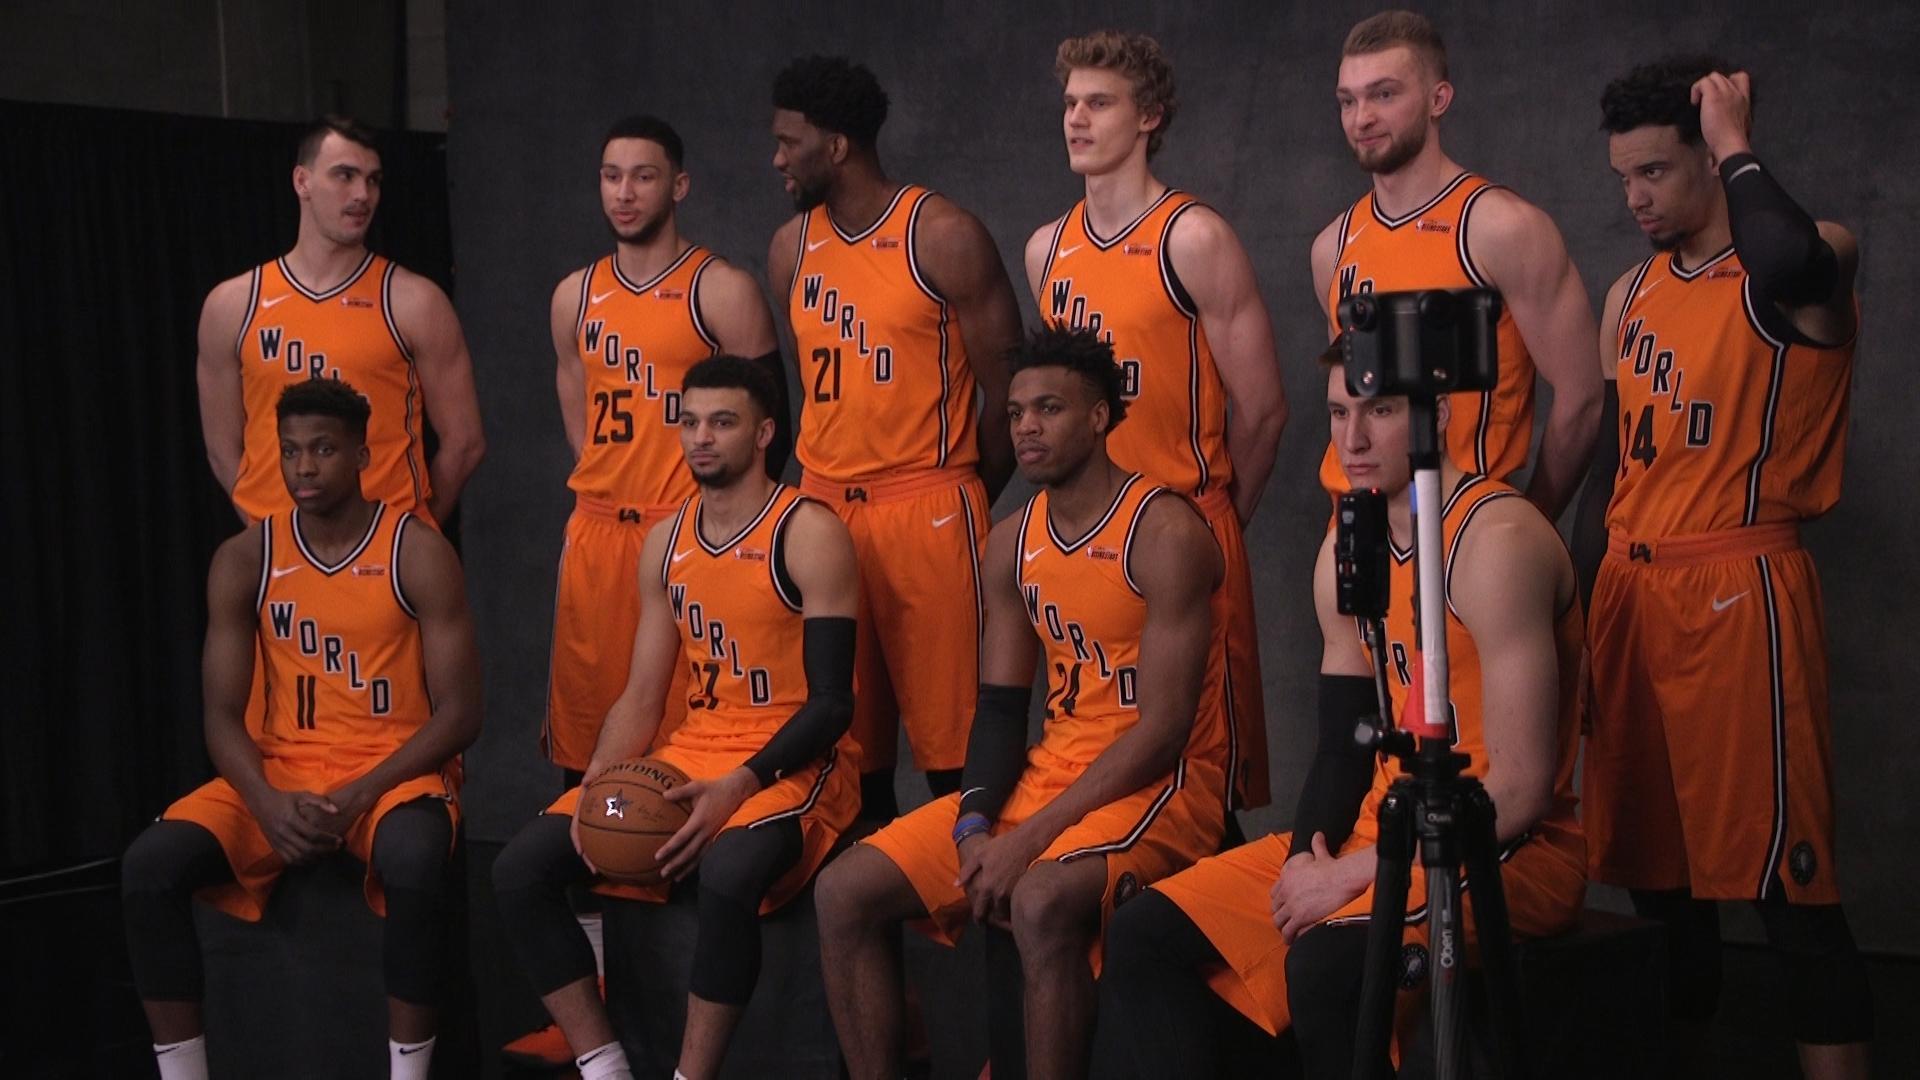 Nba Nike Wallpapers 2019: NBA All-Star 2019 Wallpapers